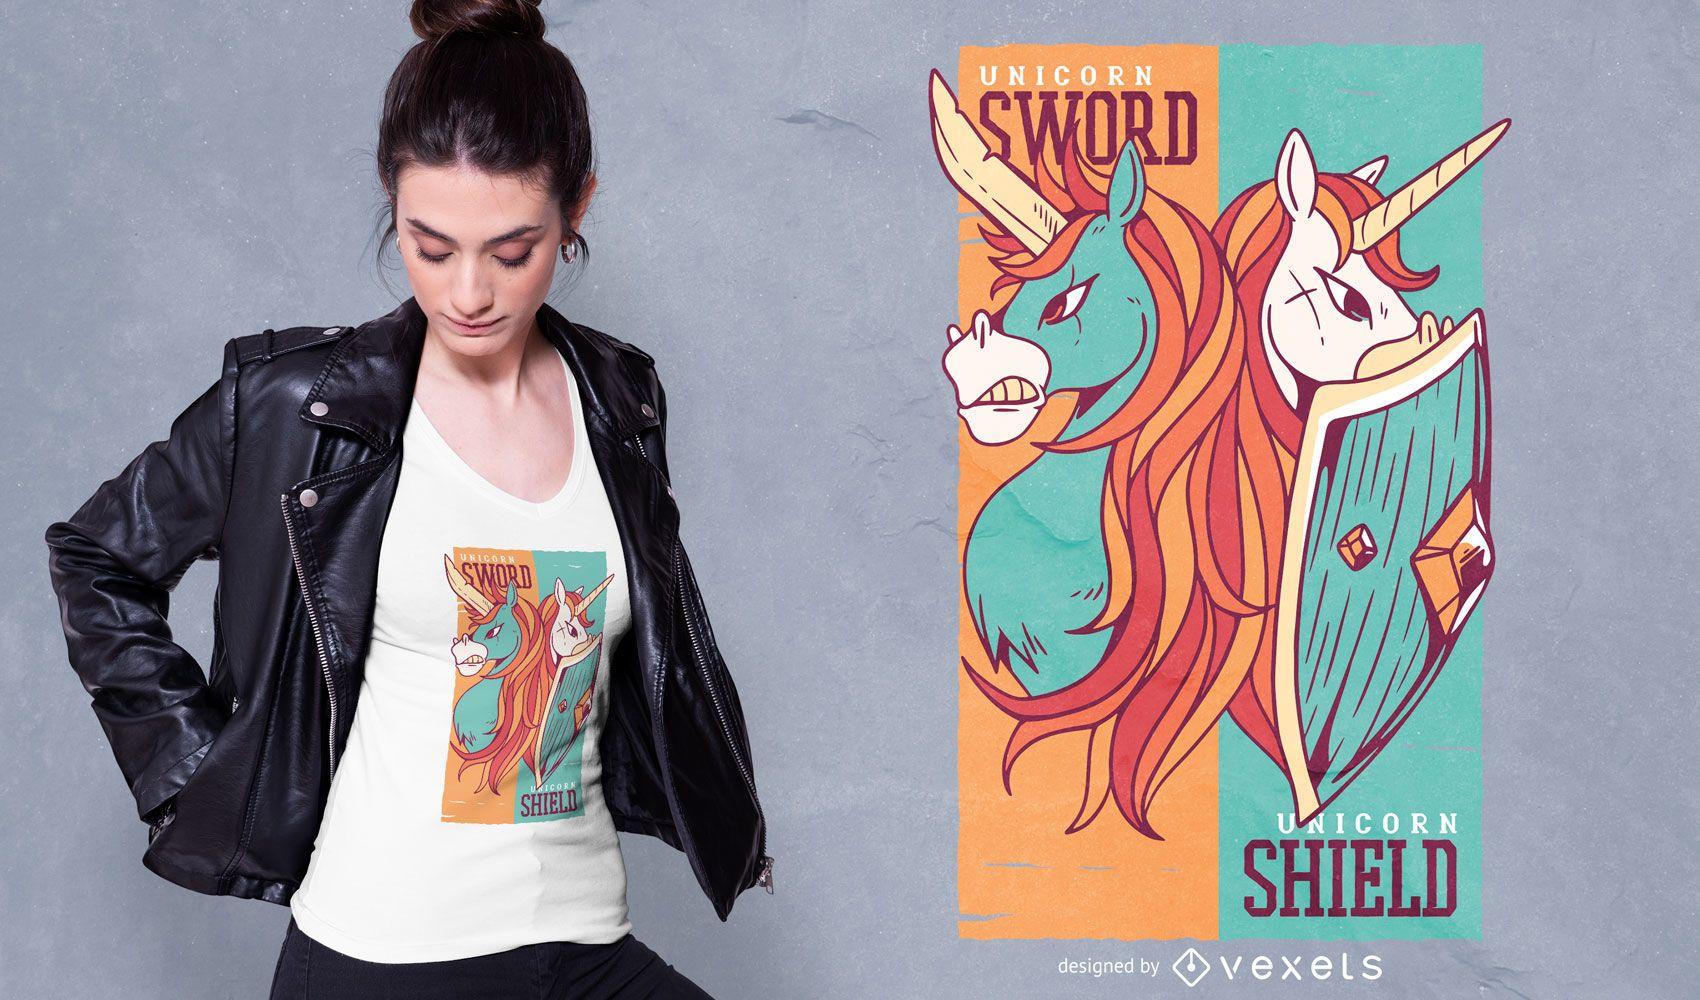 Unicorns sword and shield t-shirt design